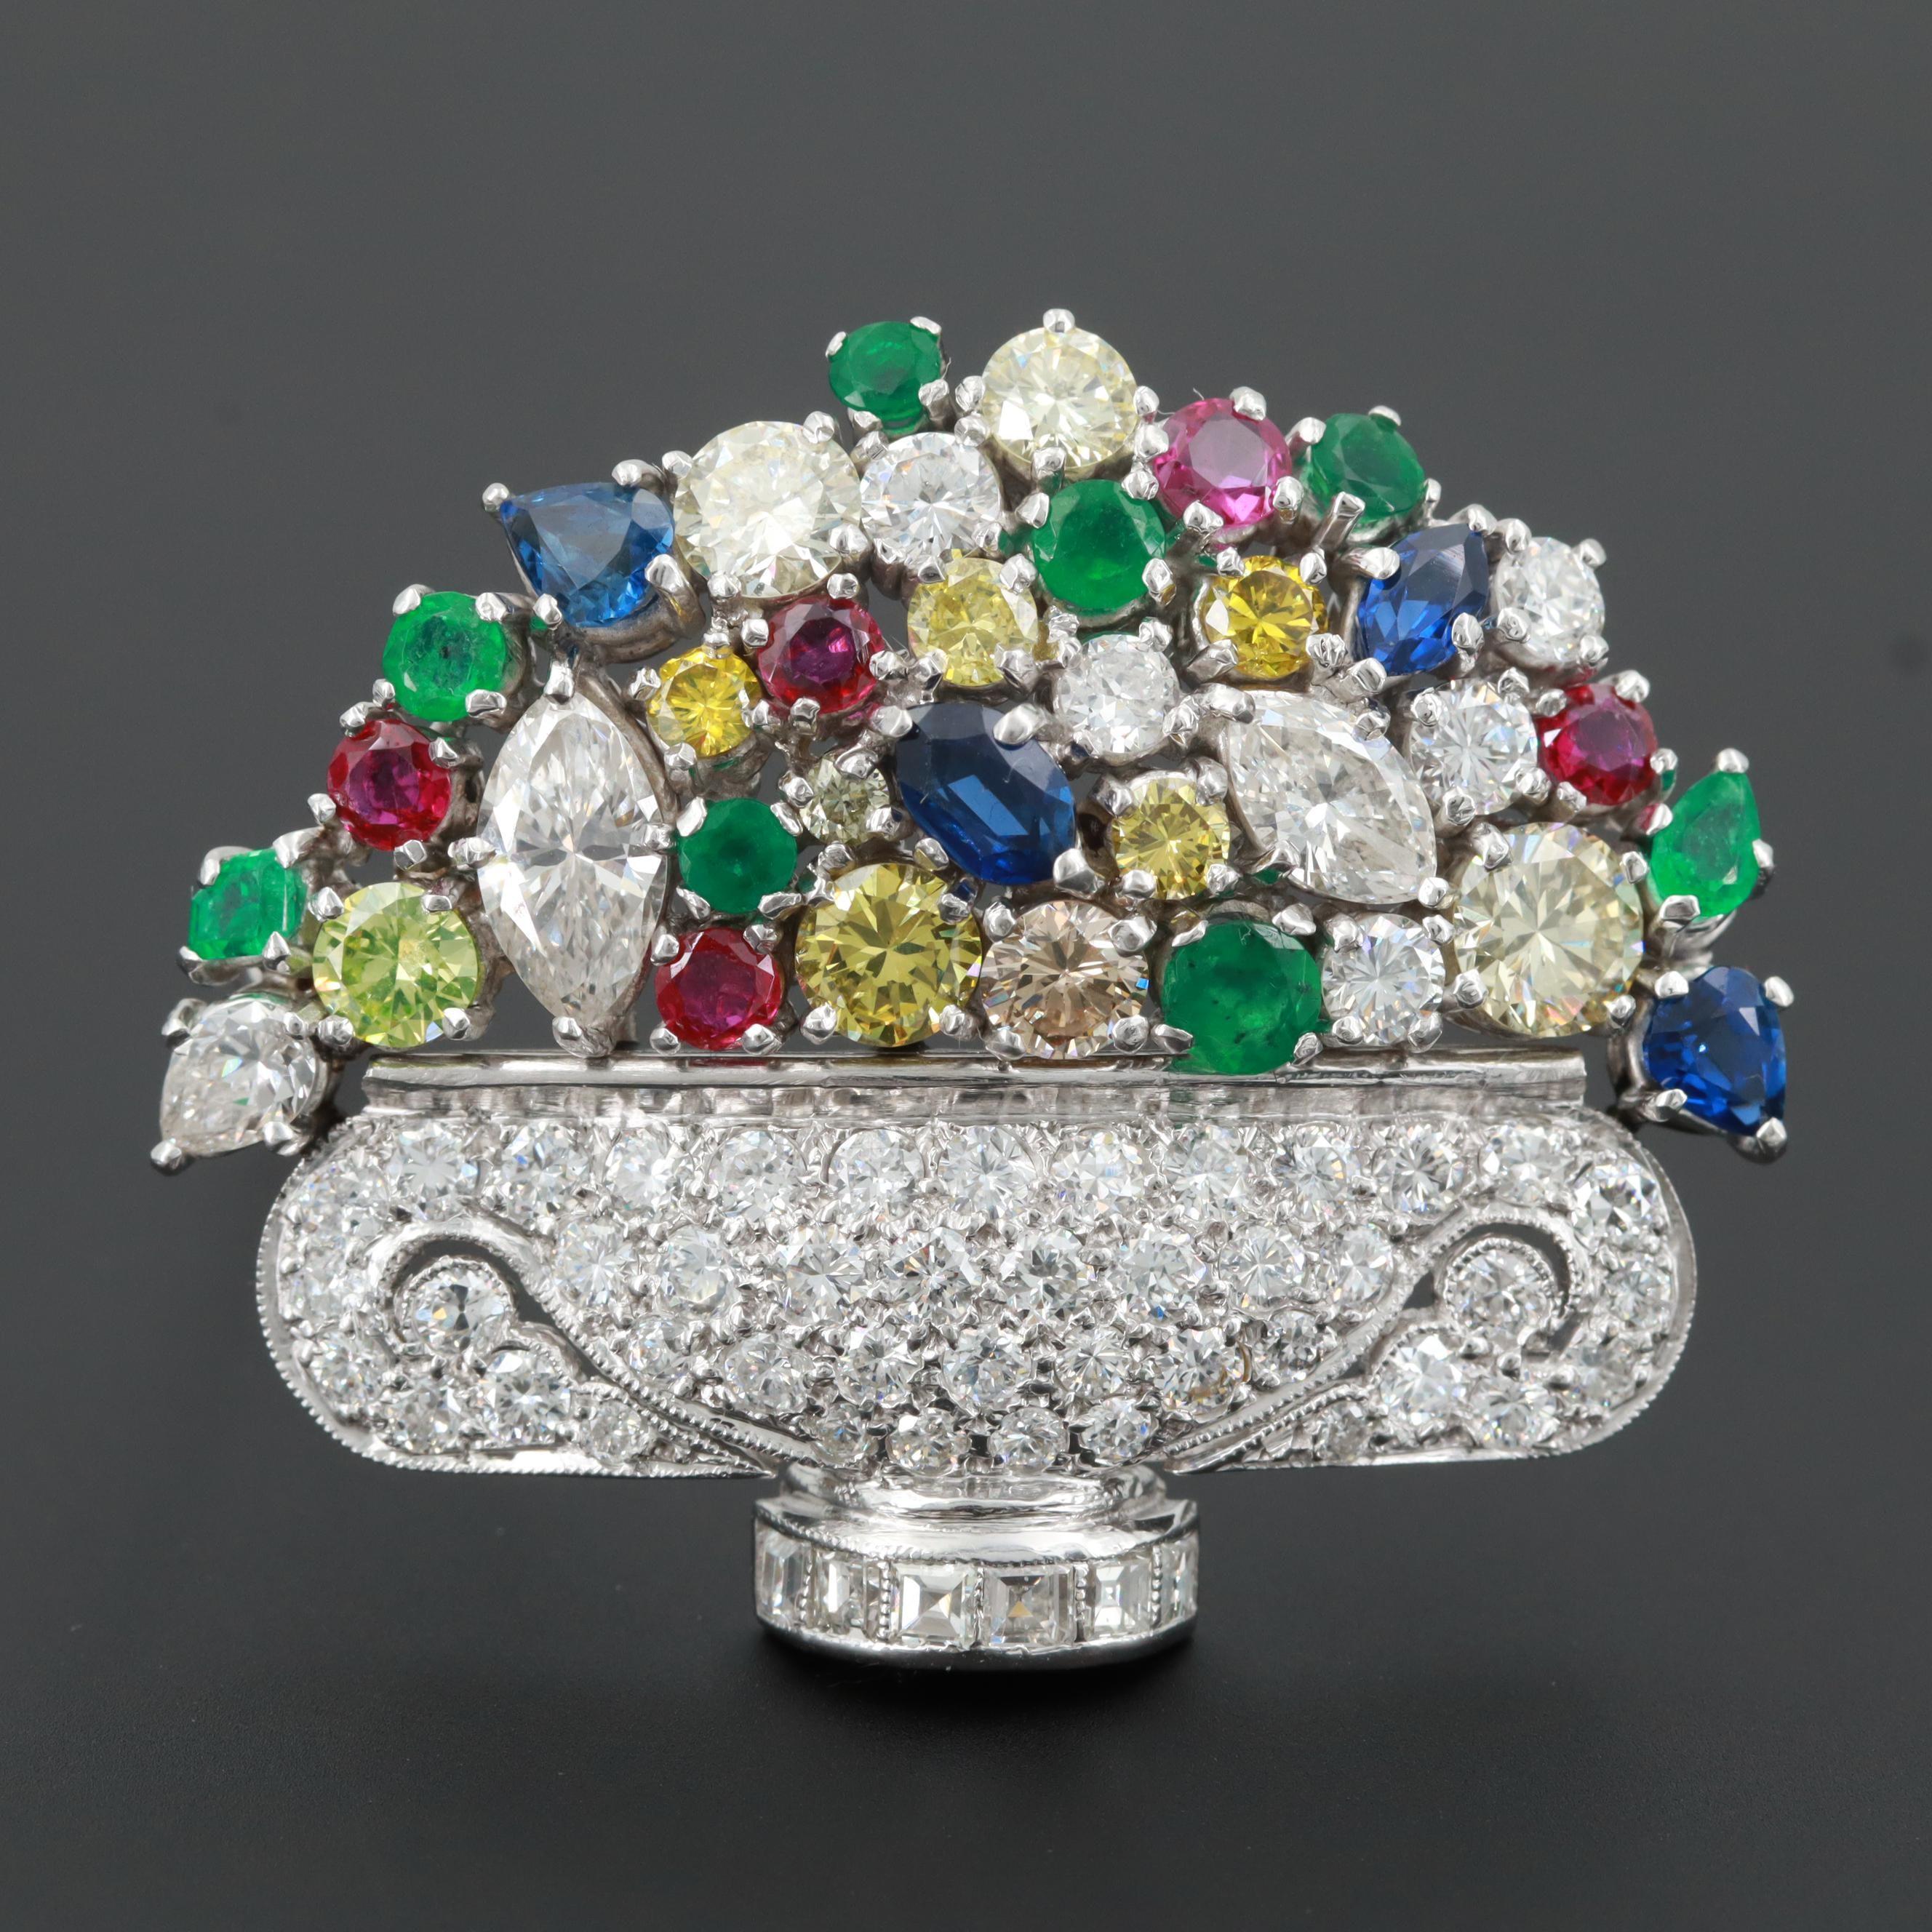 Platinum 5.50 CTW Diamond, Emerald, Ruby, and Blue Sapphire Giardinetto Brooch